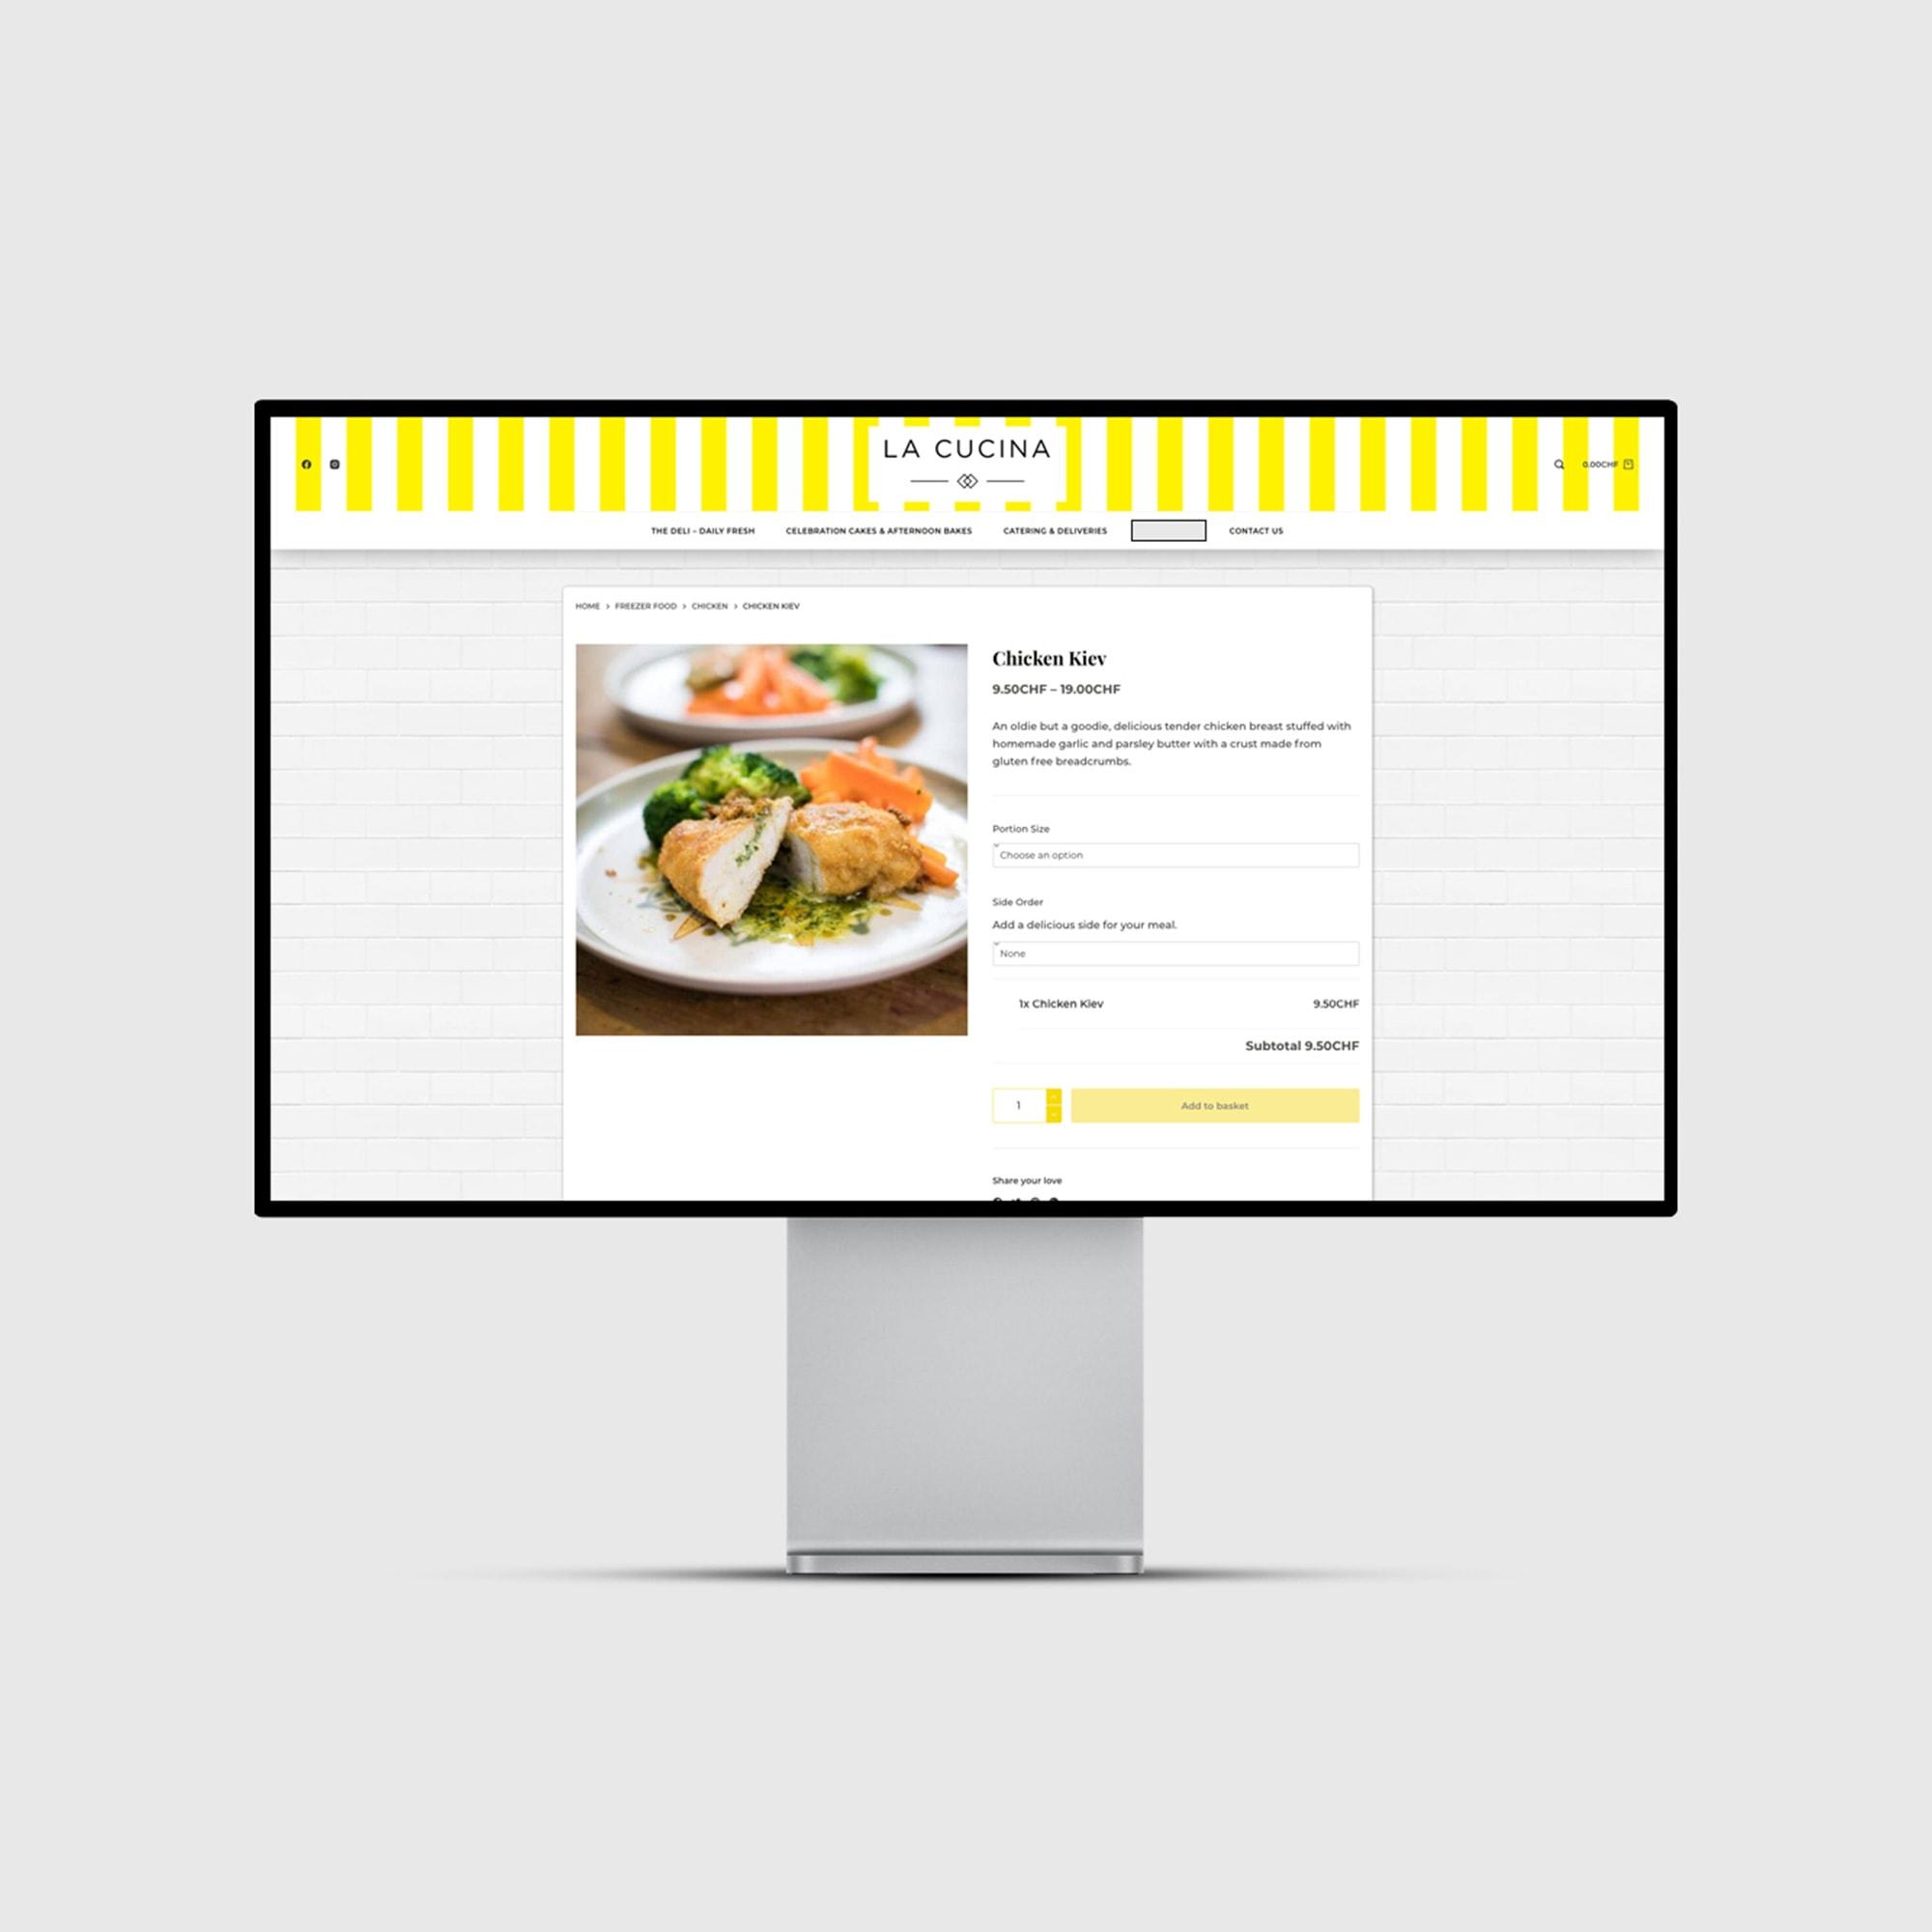 La Cucina - Desktop View